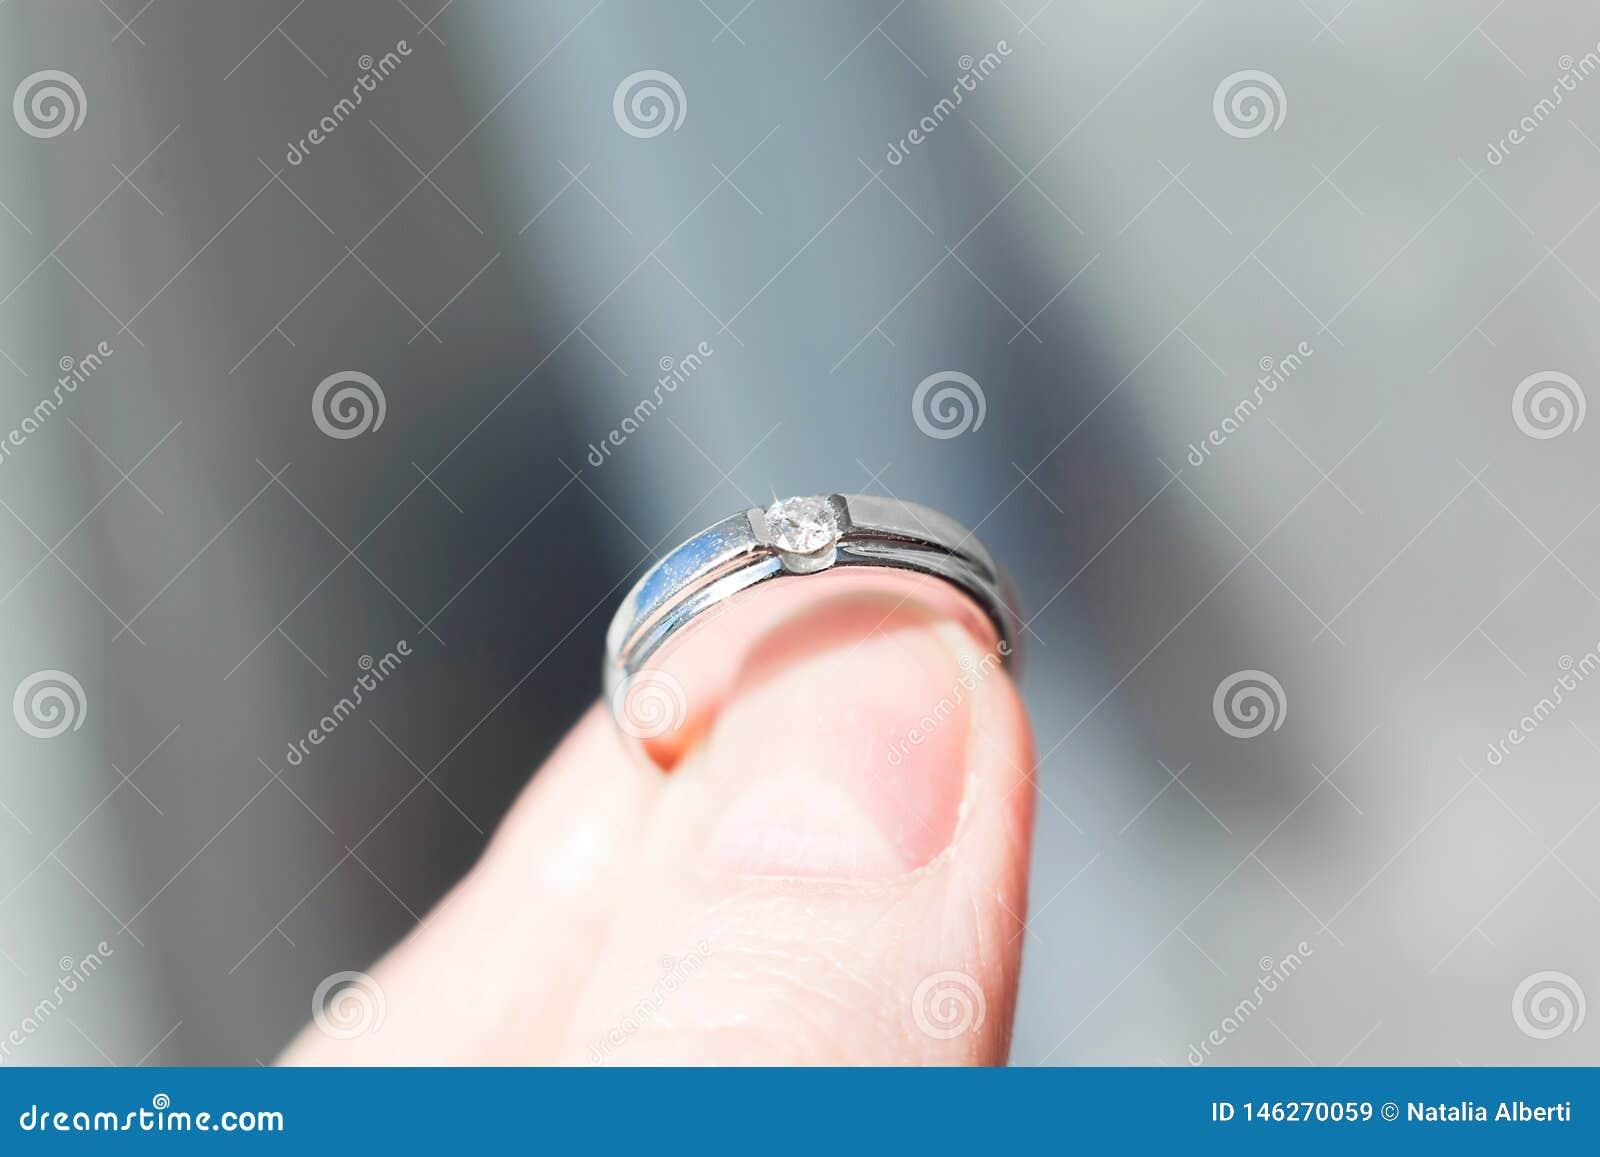 Anillo con brillante en fingeres